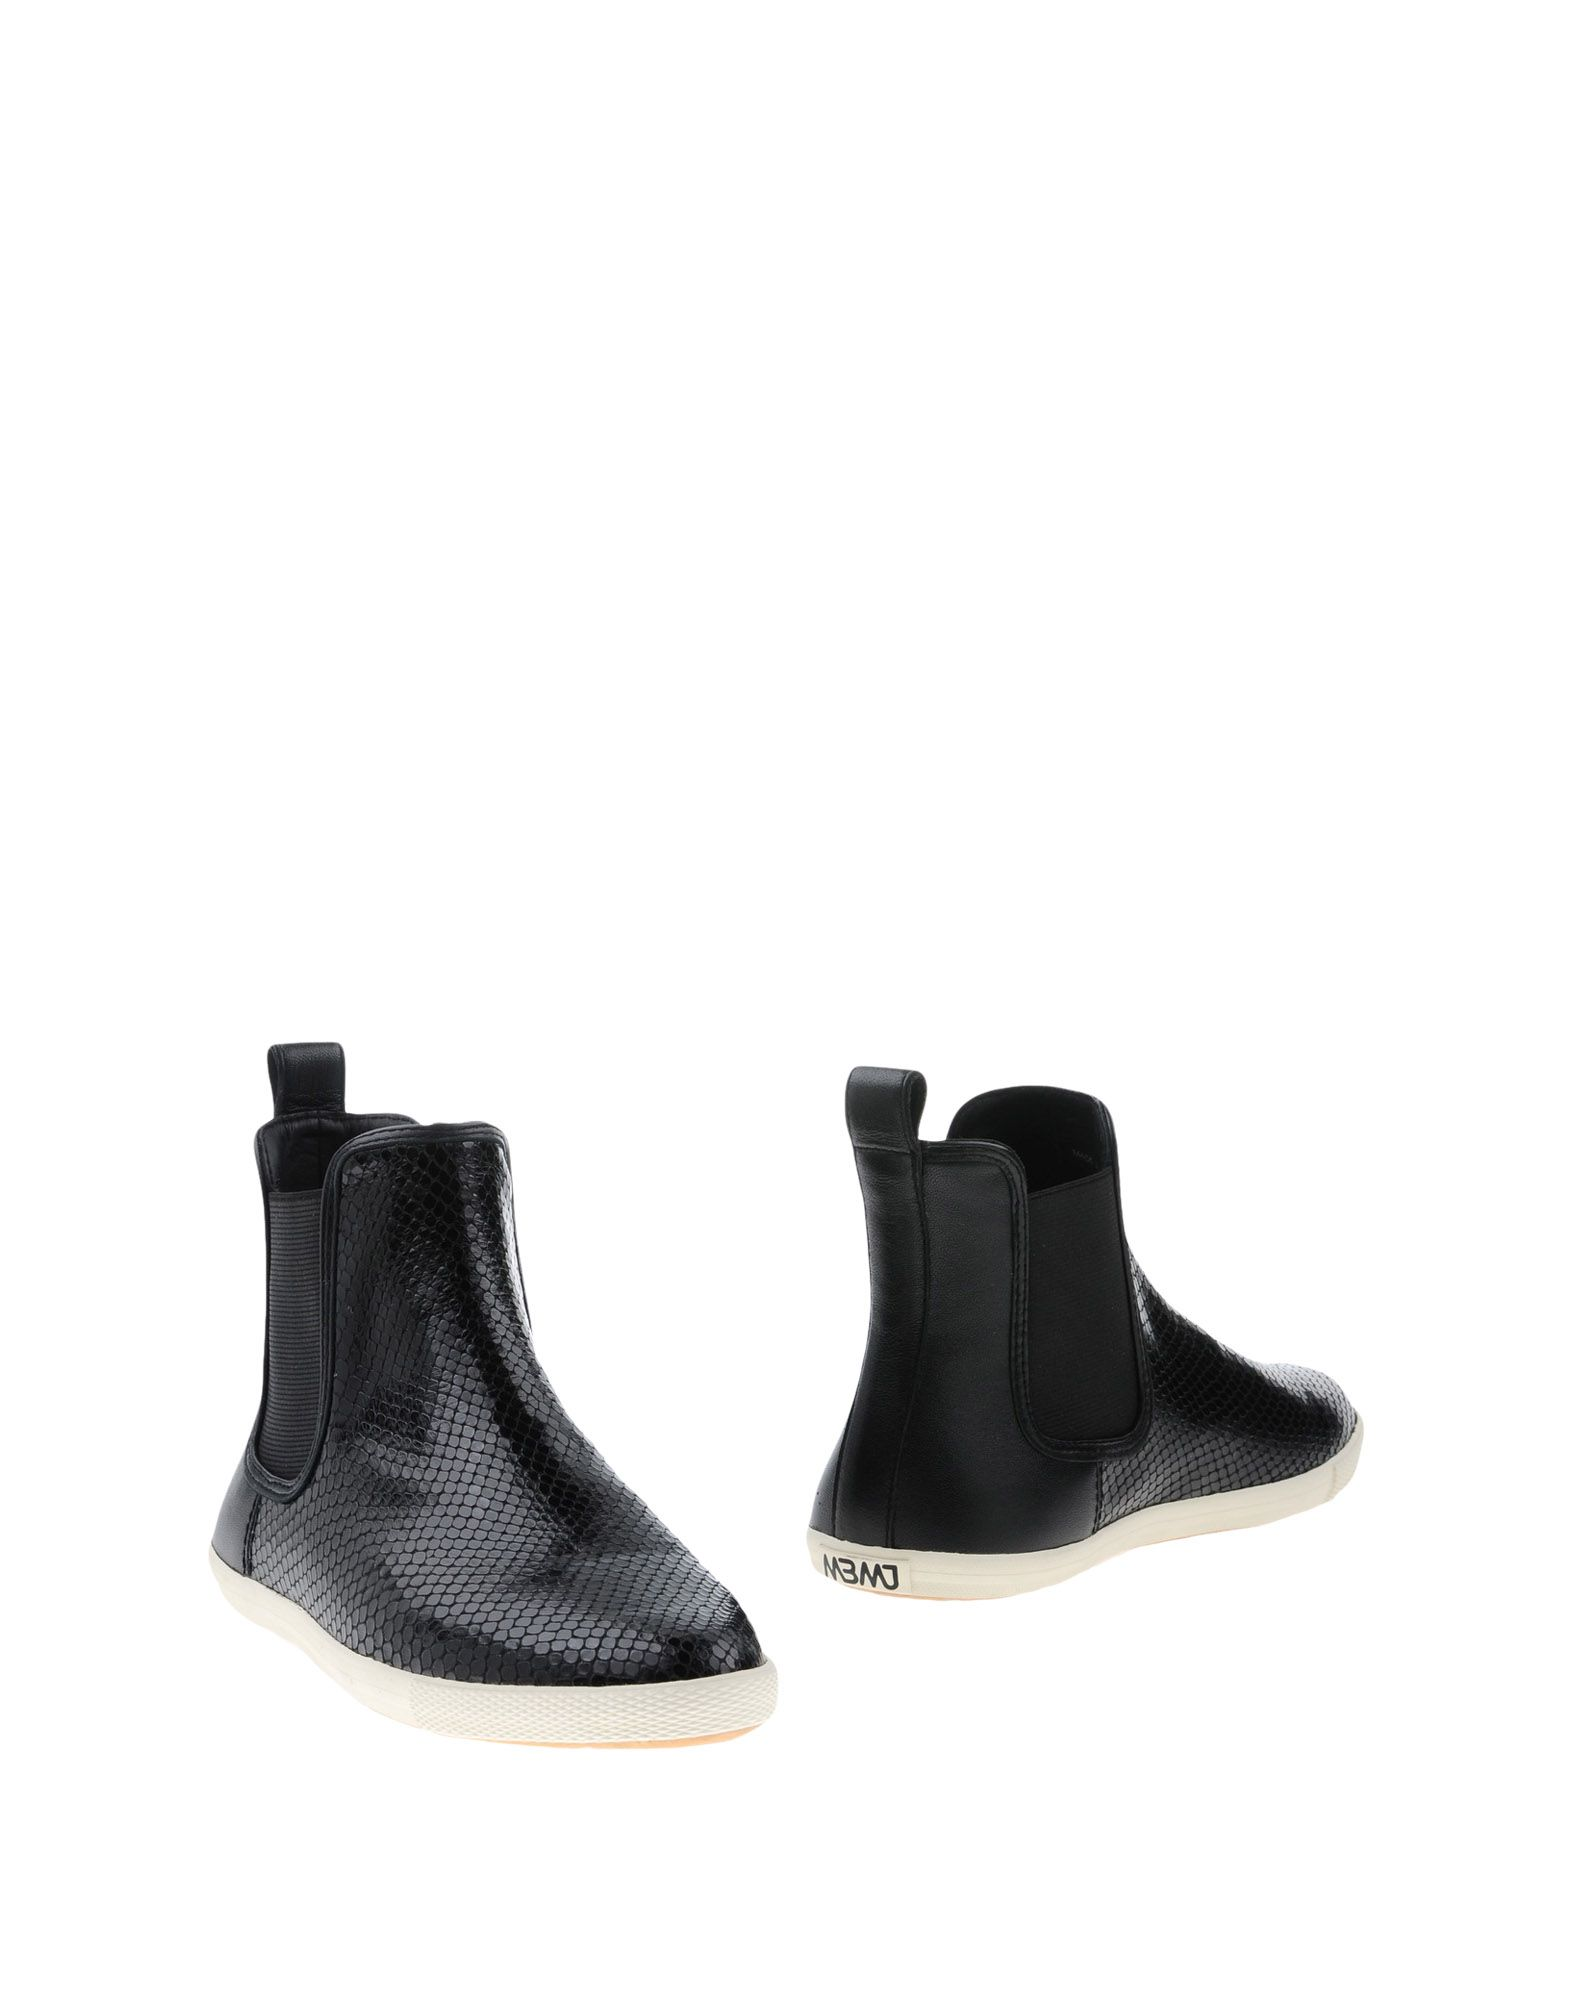 Stilvolle billige Stiefel Schuhe Marc By Marc Jacobs Chelsea Stiefel billige Damen  11350725SH 33d8a5